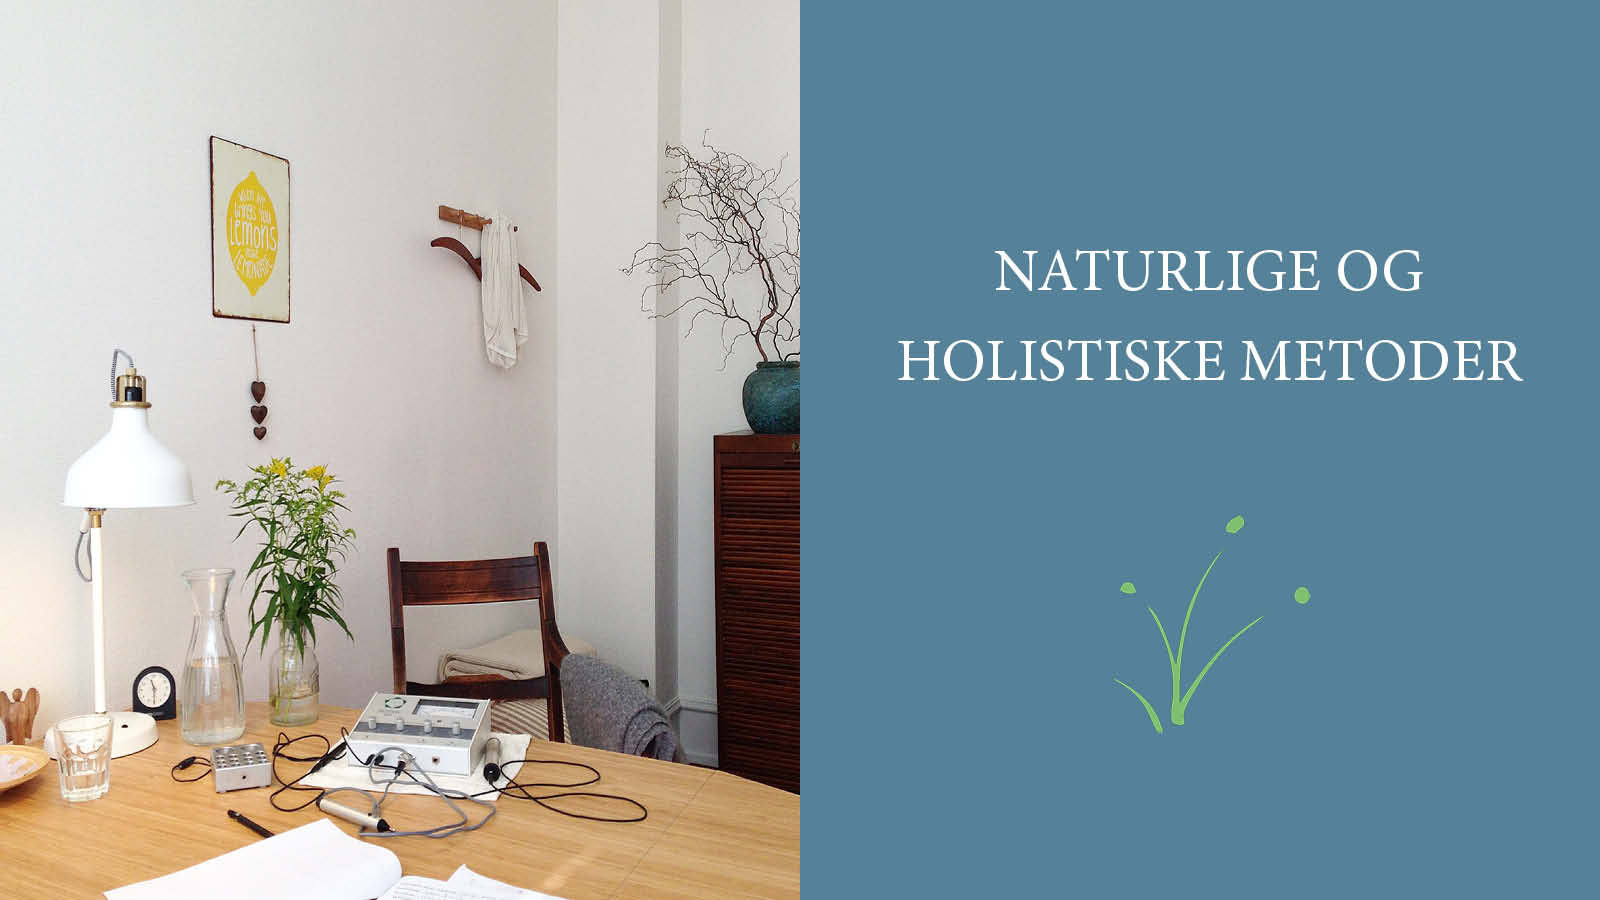 Lisbeth Tordendahl holistisk klinik